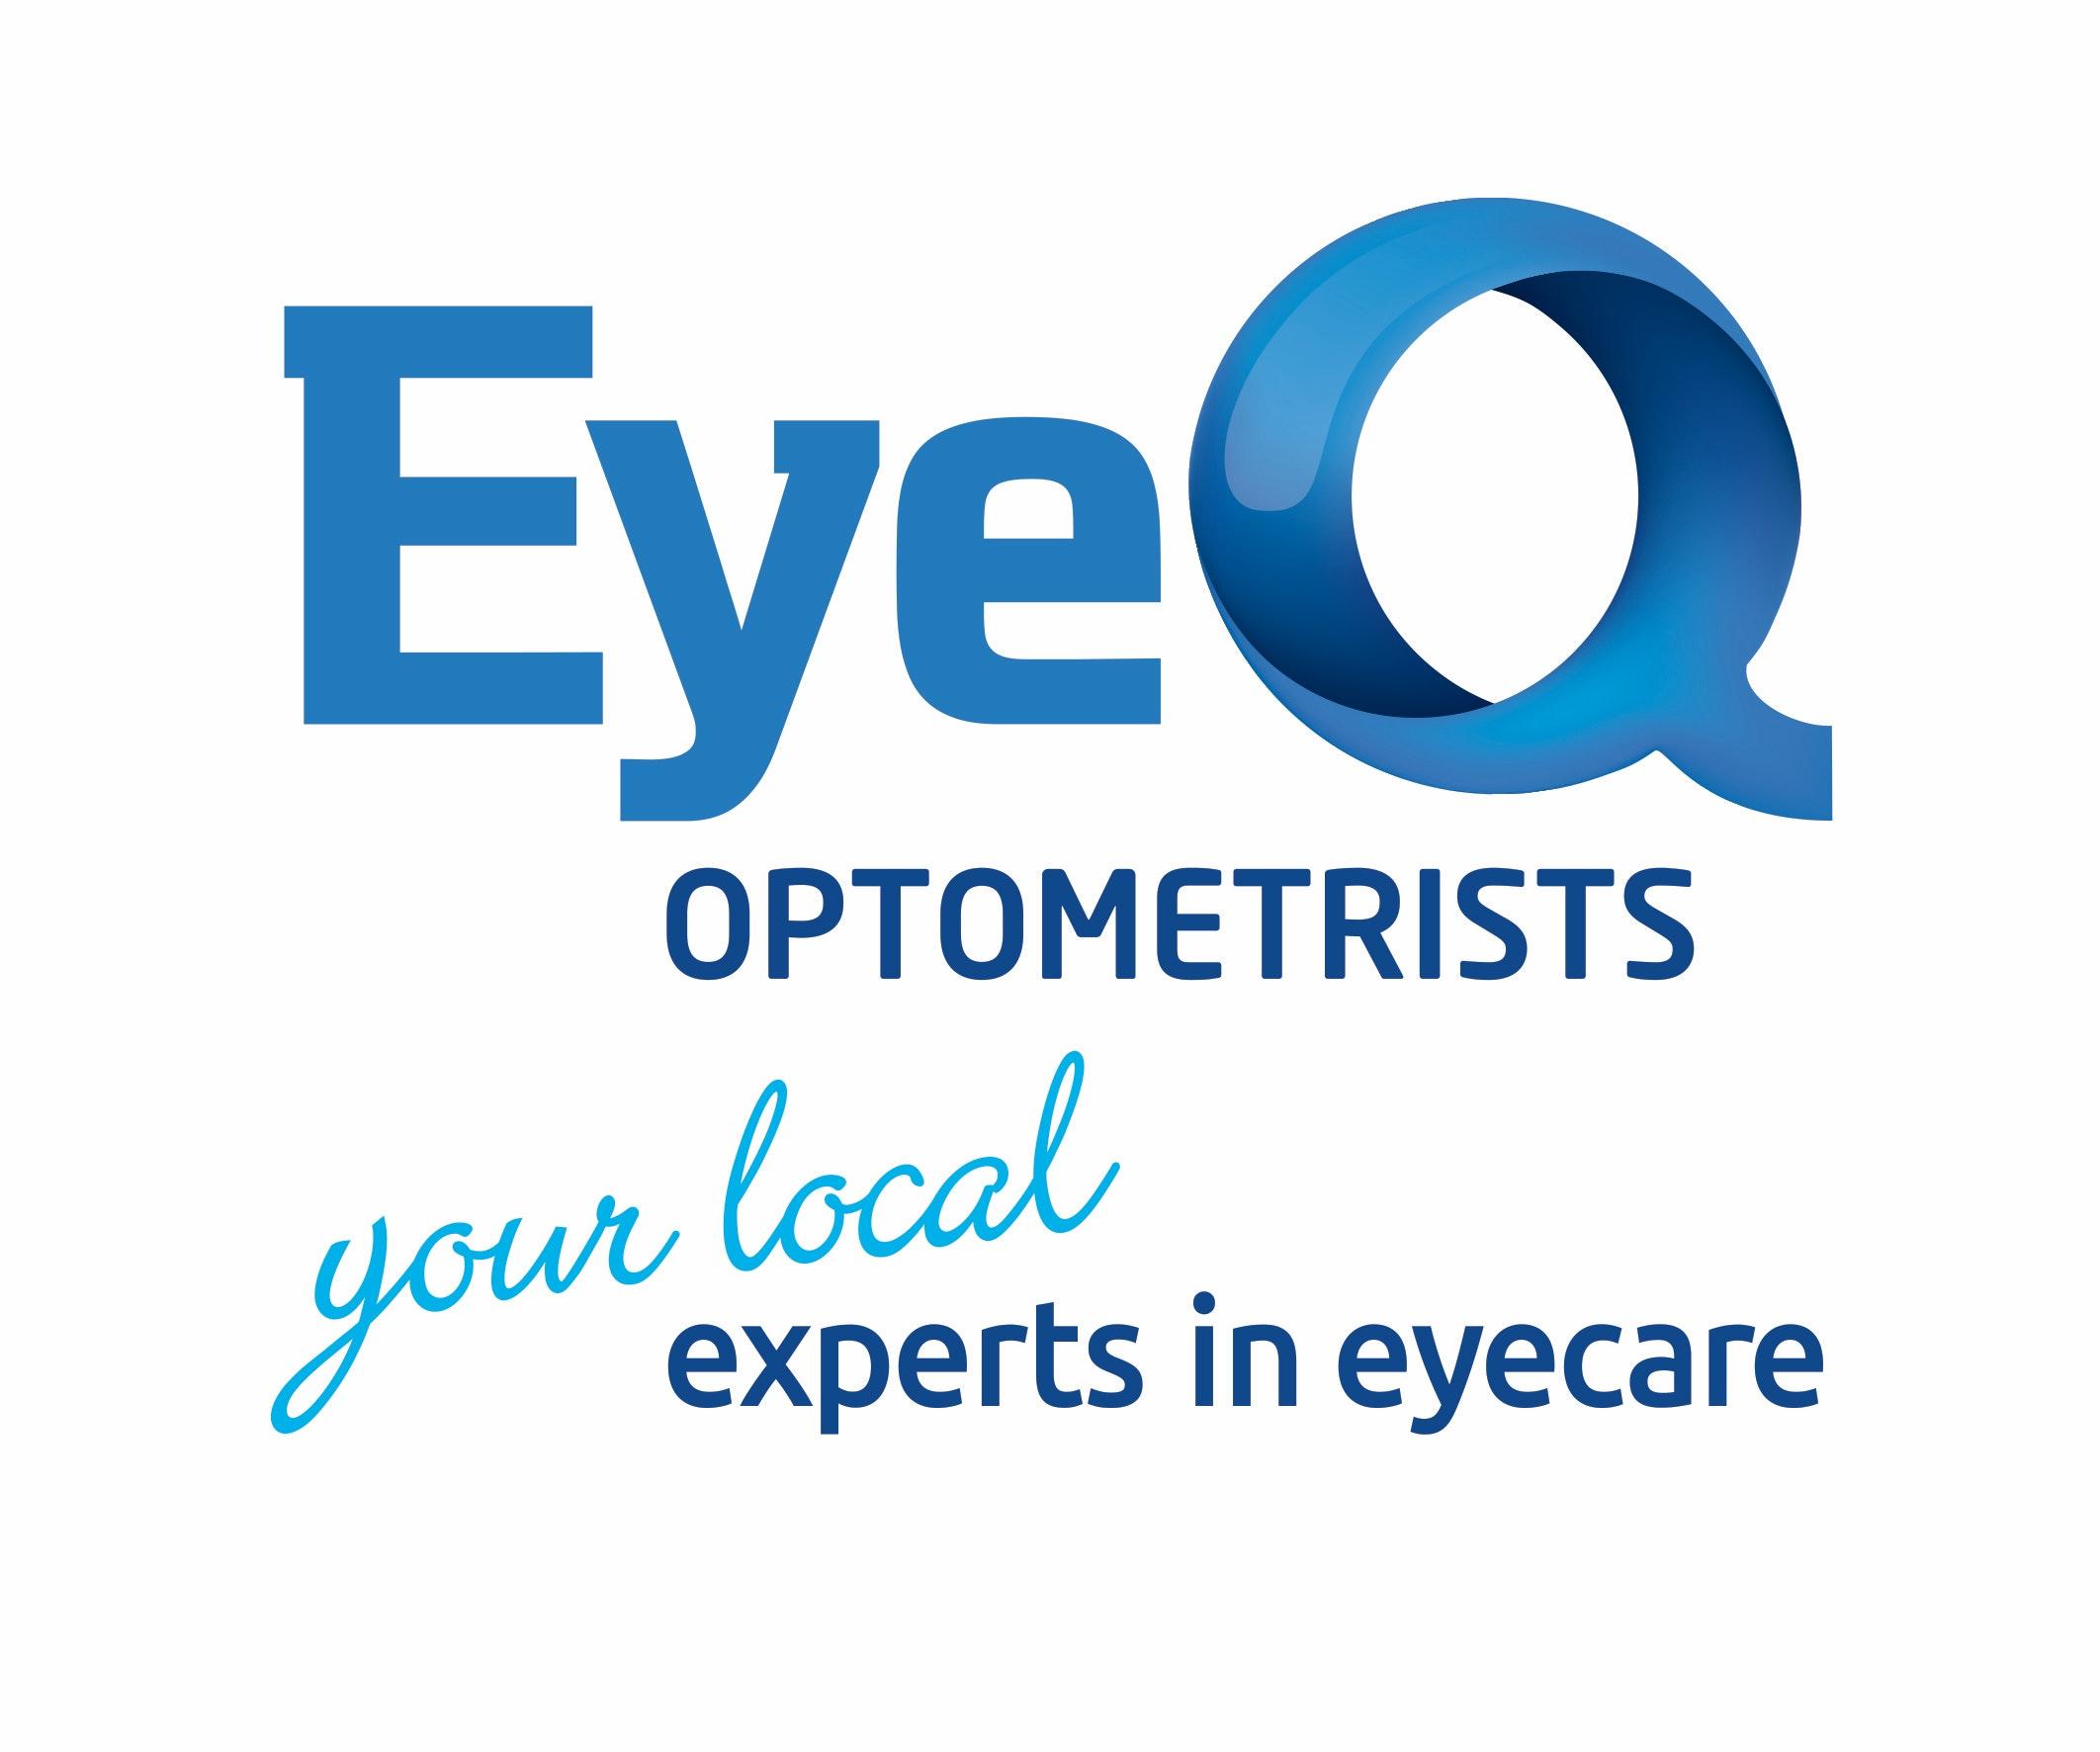 Peter Rose EyeQ Optometrists Nowra